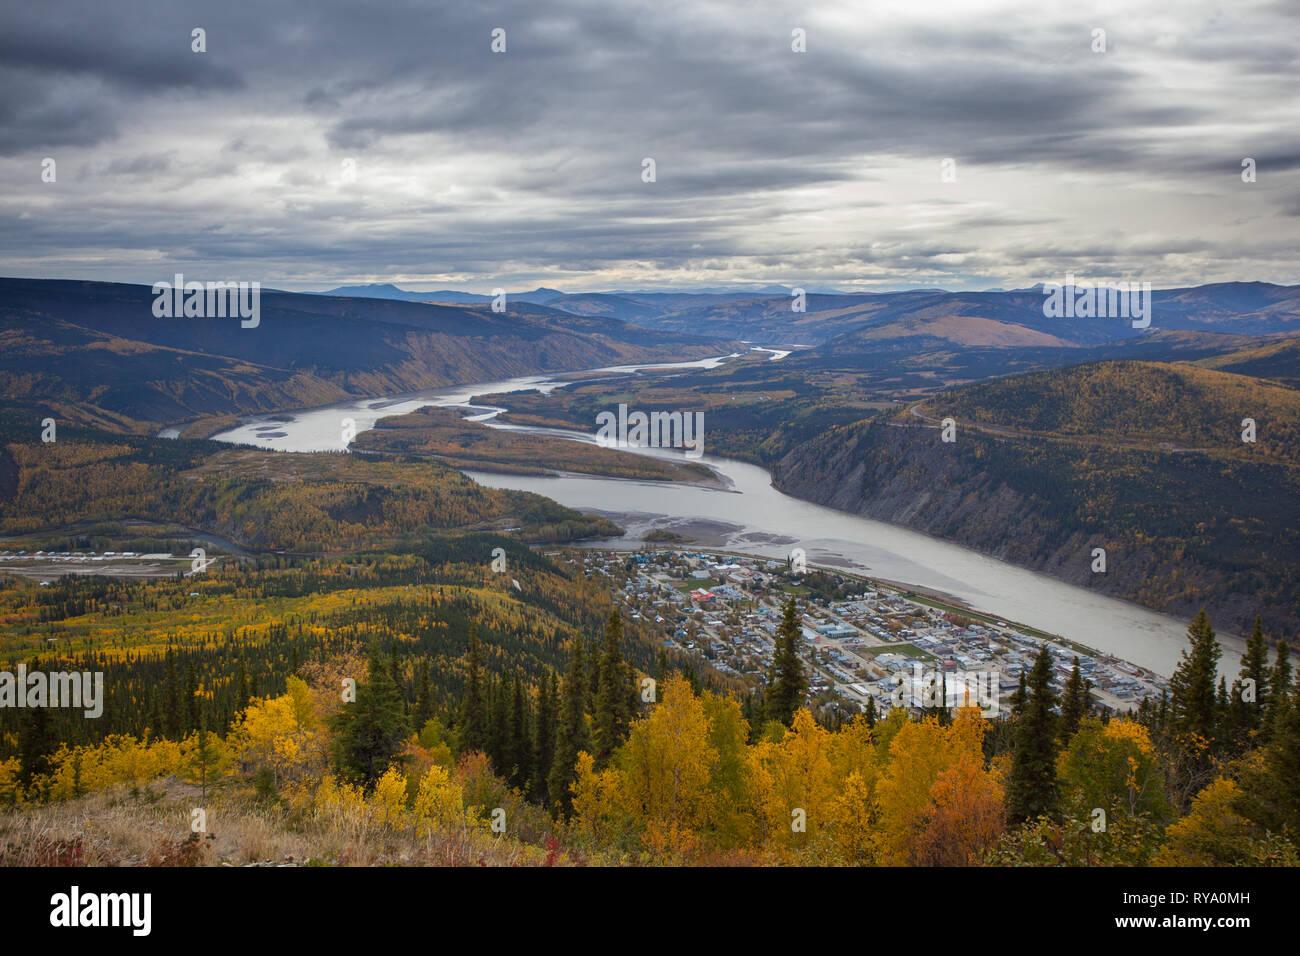 Dawson City, Klondike Region, Yukon Territory, Canada - Stock Image